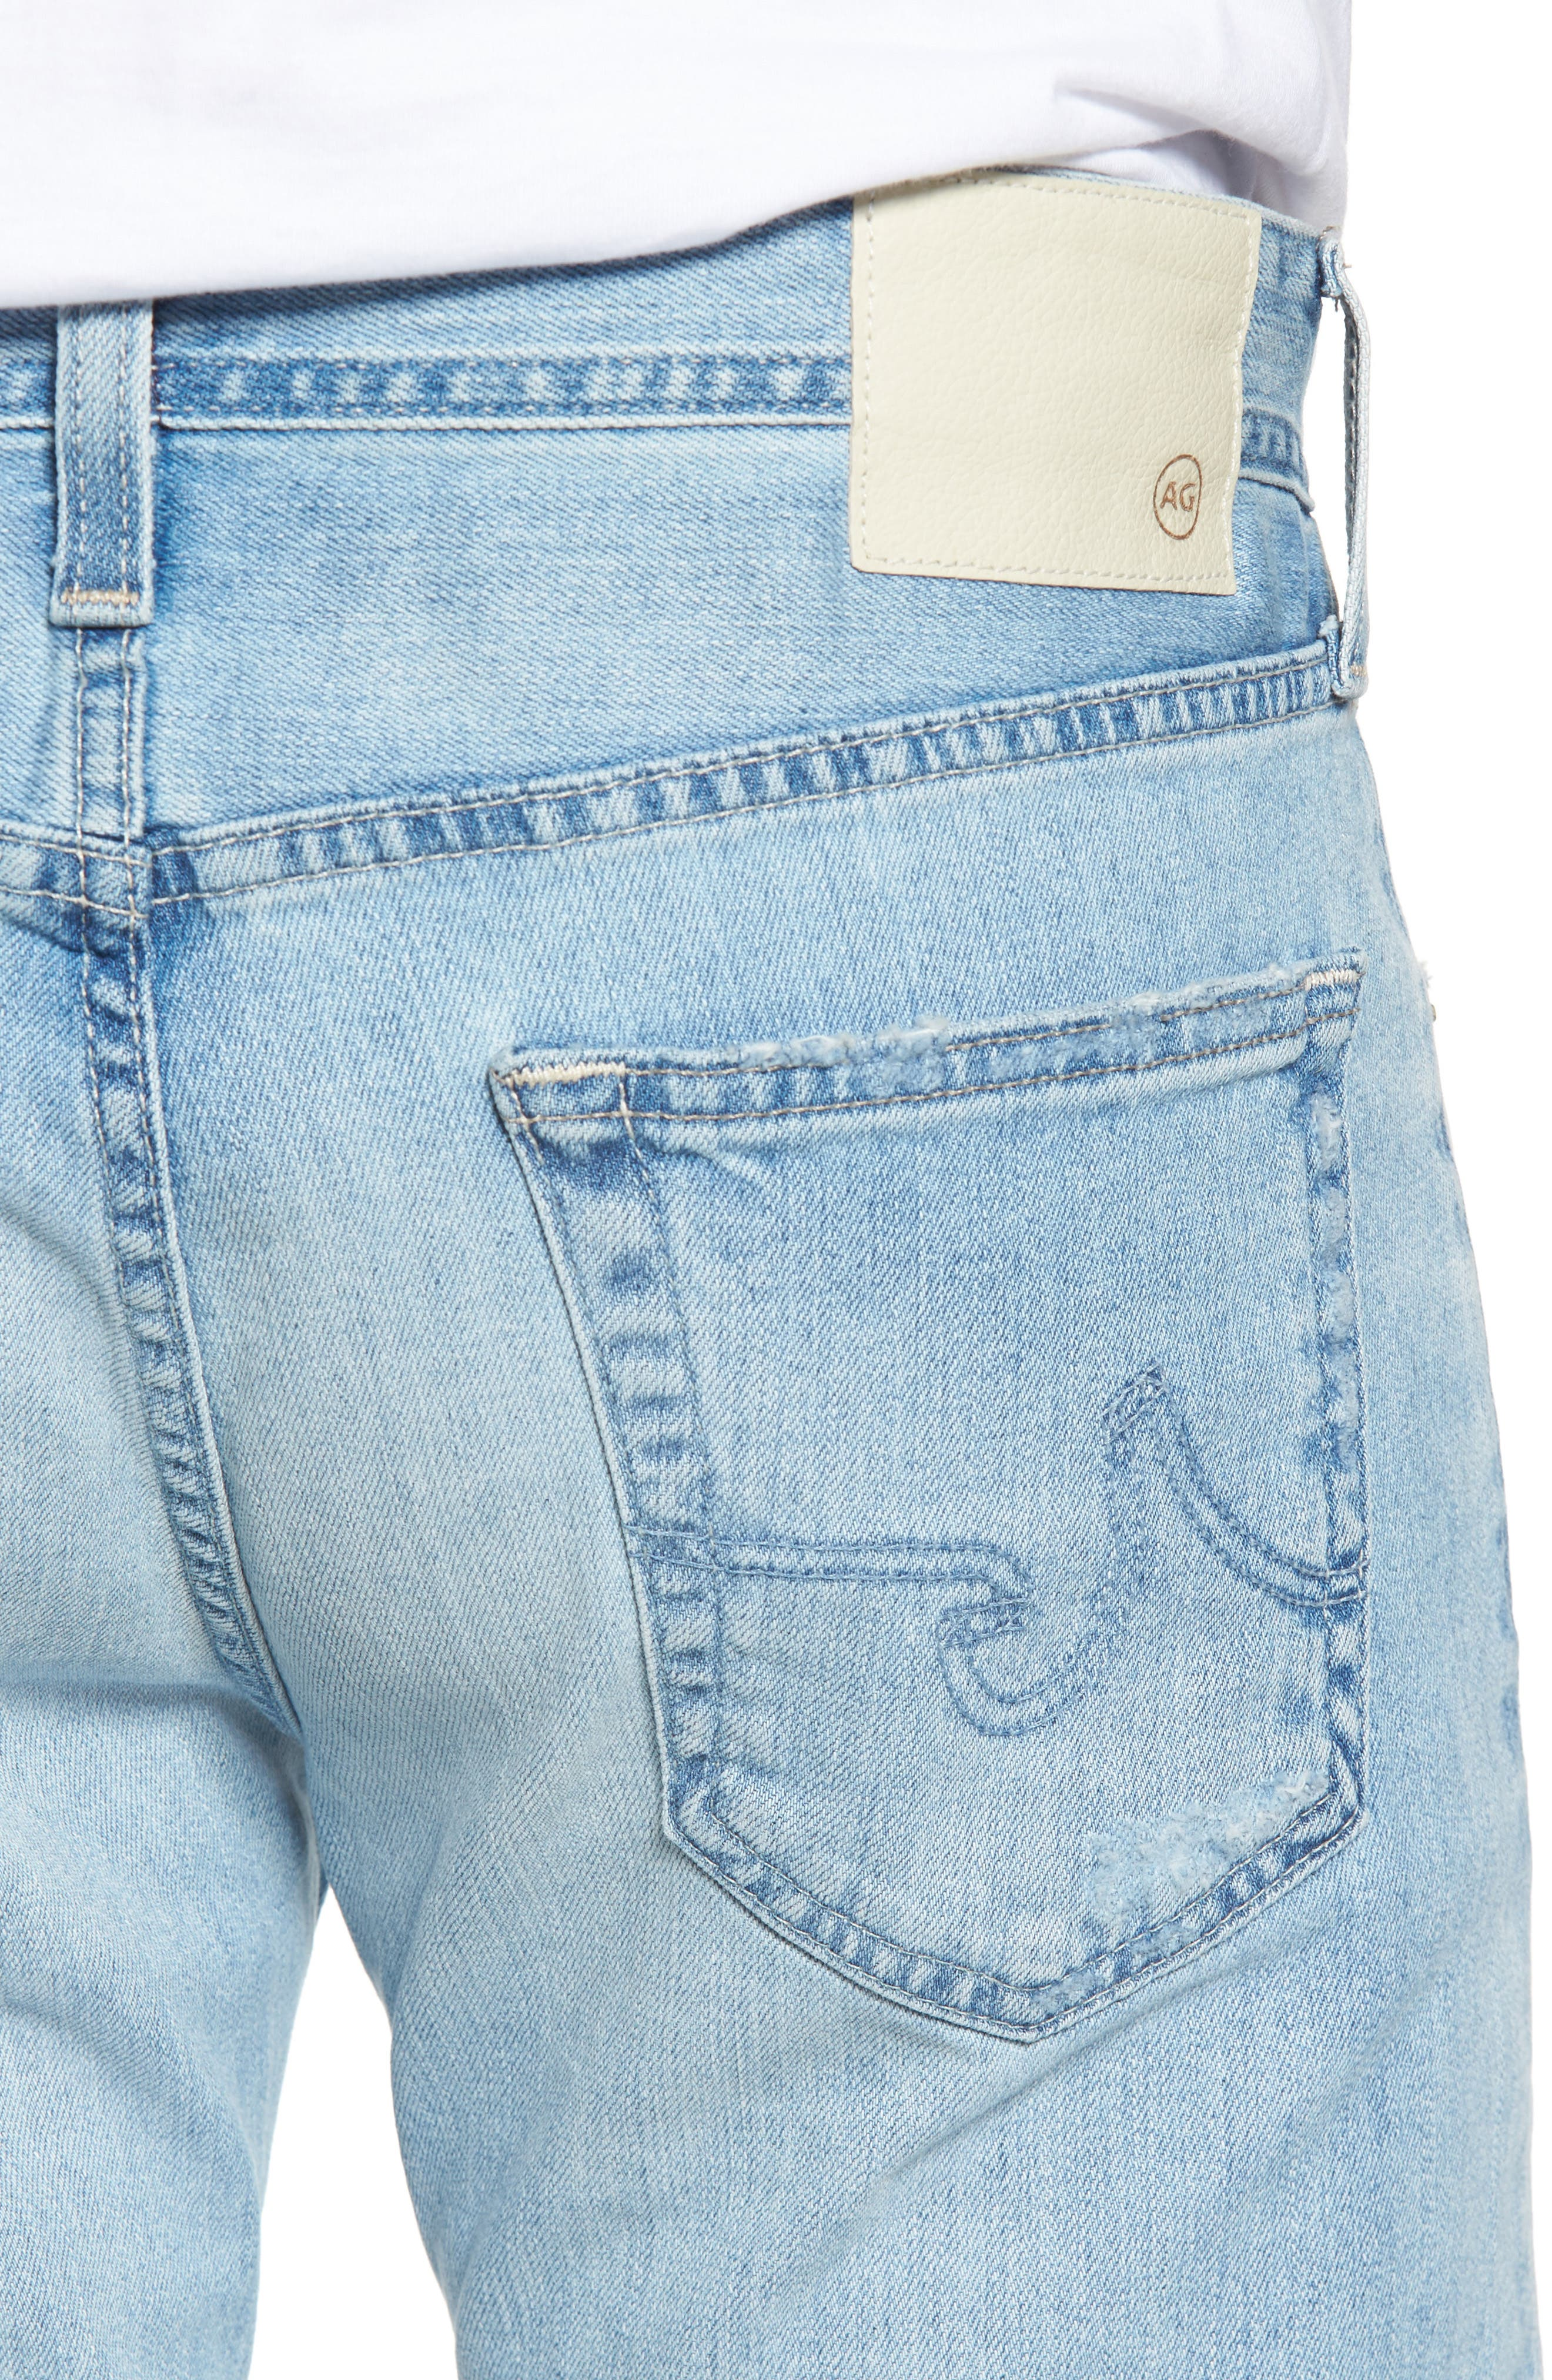 Dylan Slim Skinny Fit Jeans,                             Alternate thumbnail 4, color,                             23 Years Oceanside